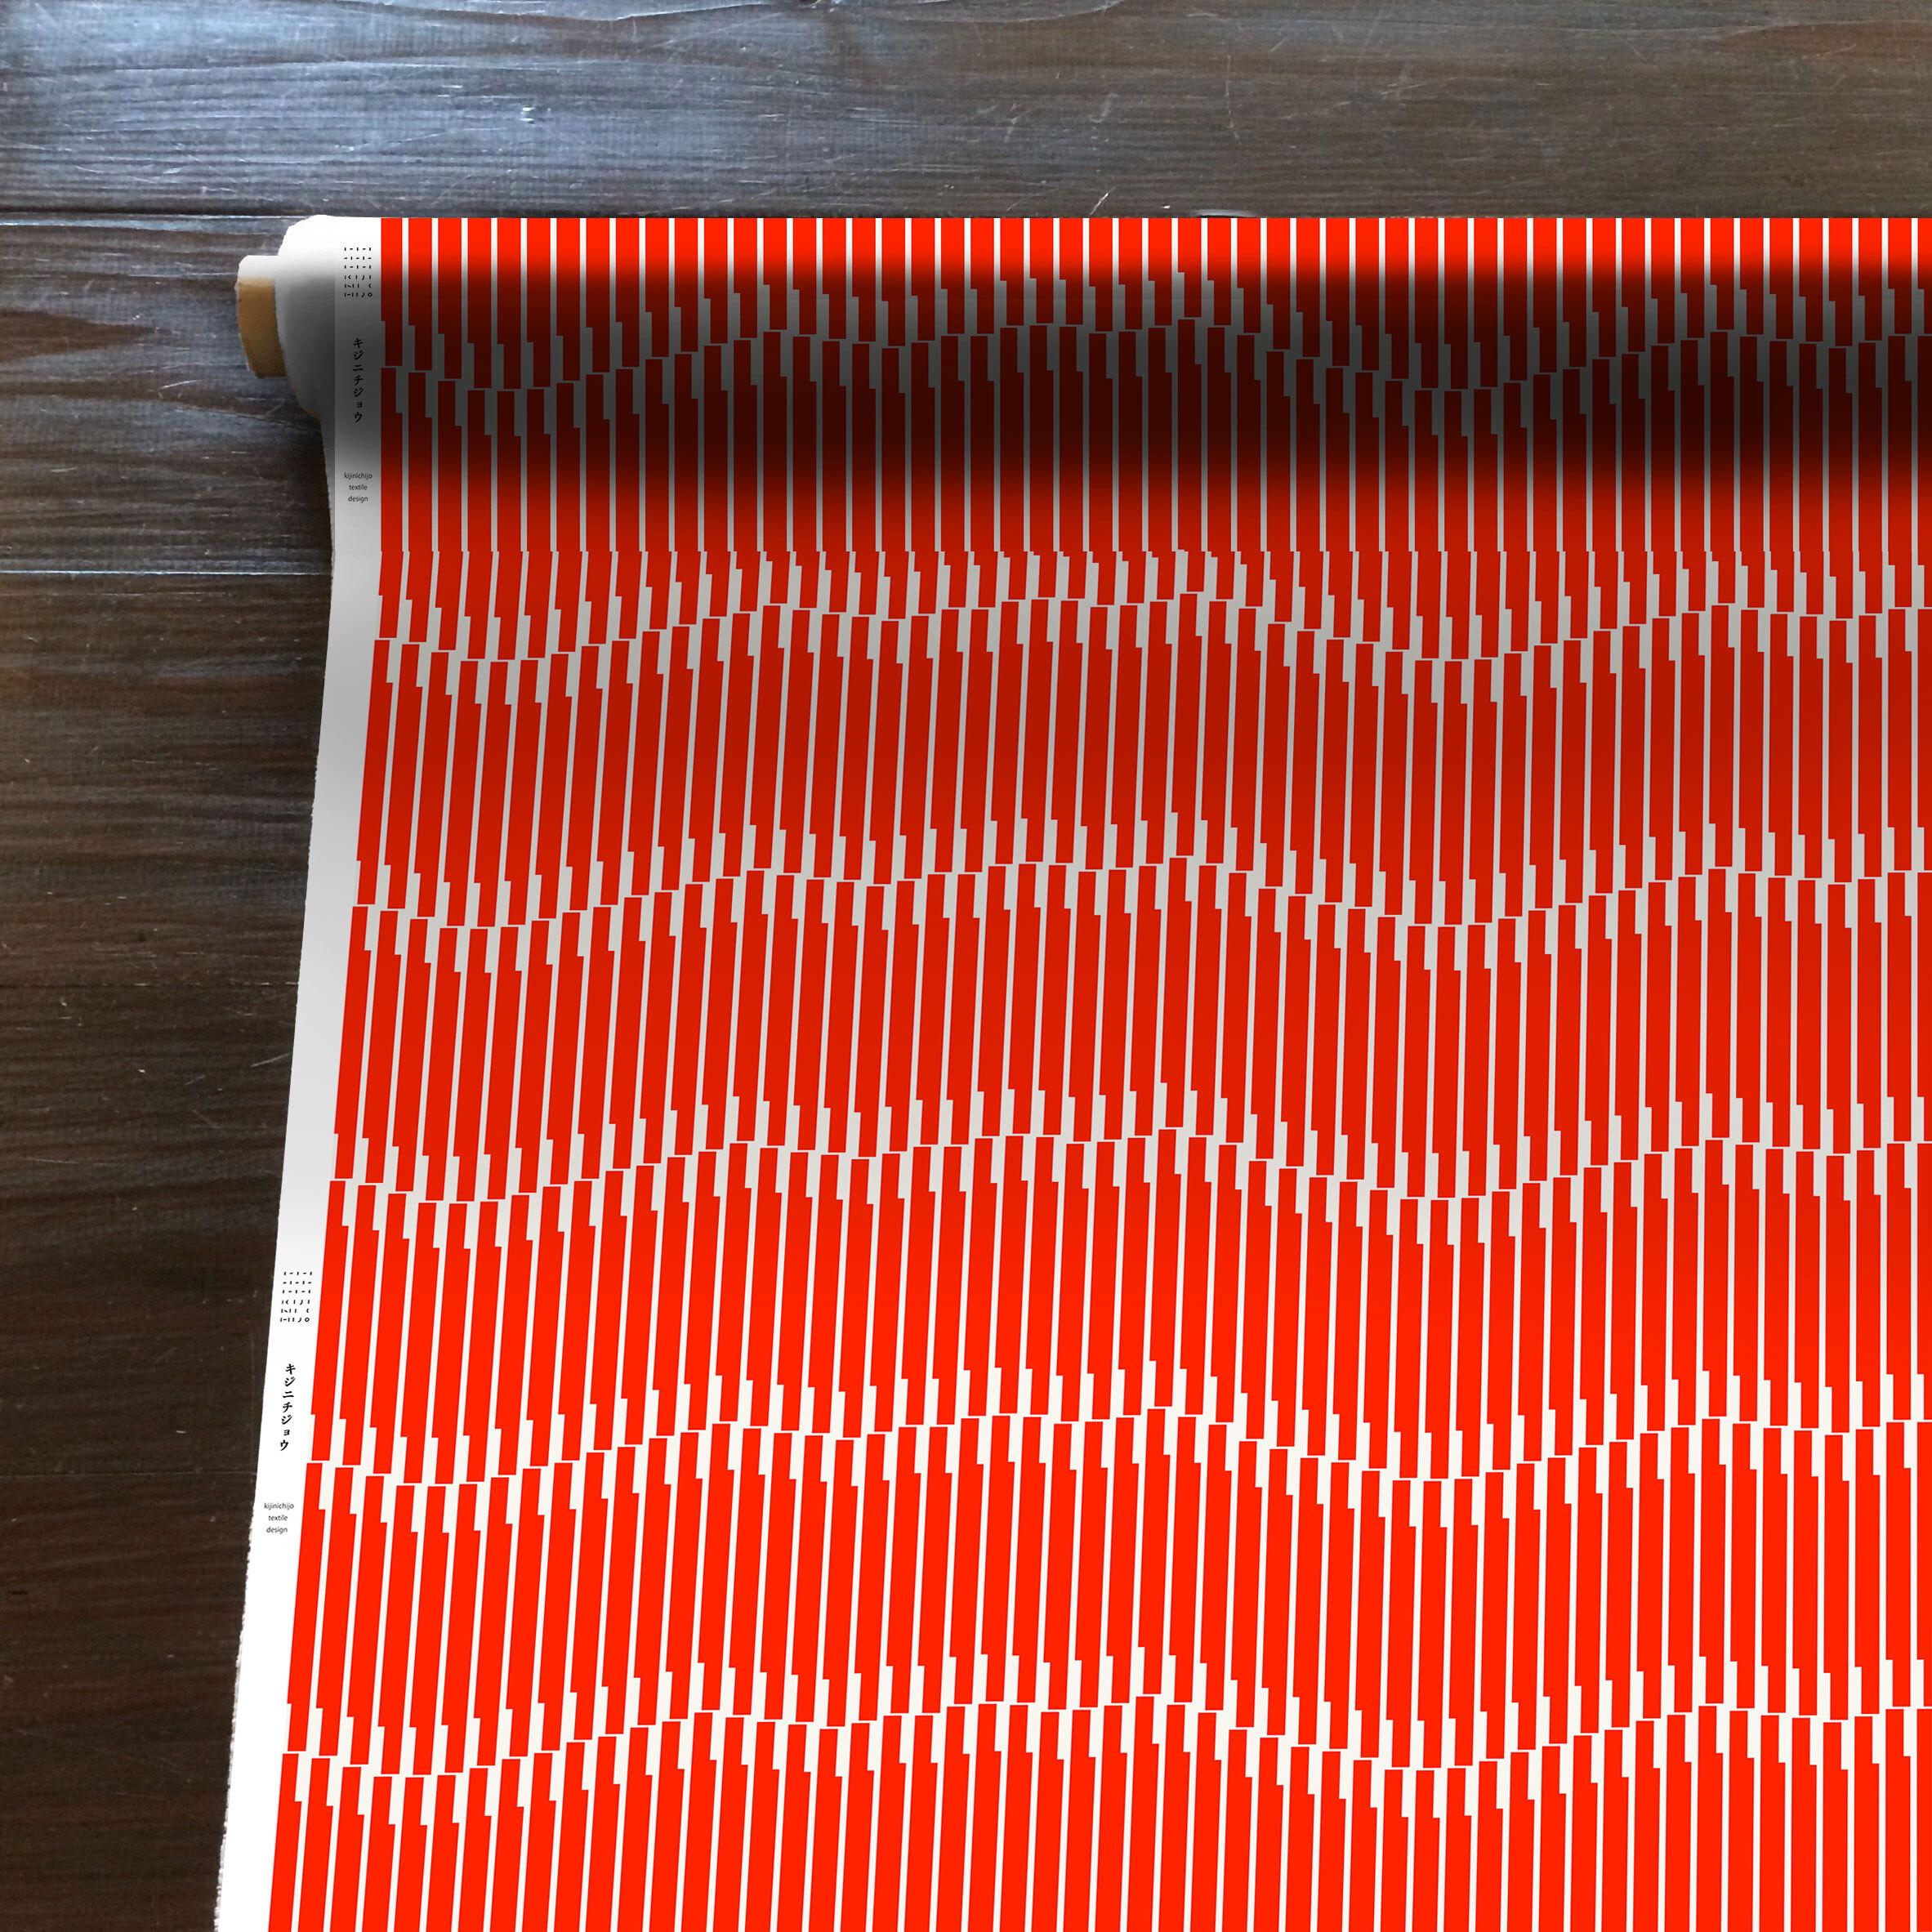 Sand crest(赤)[50cm×110cm]cotton